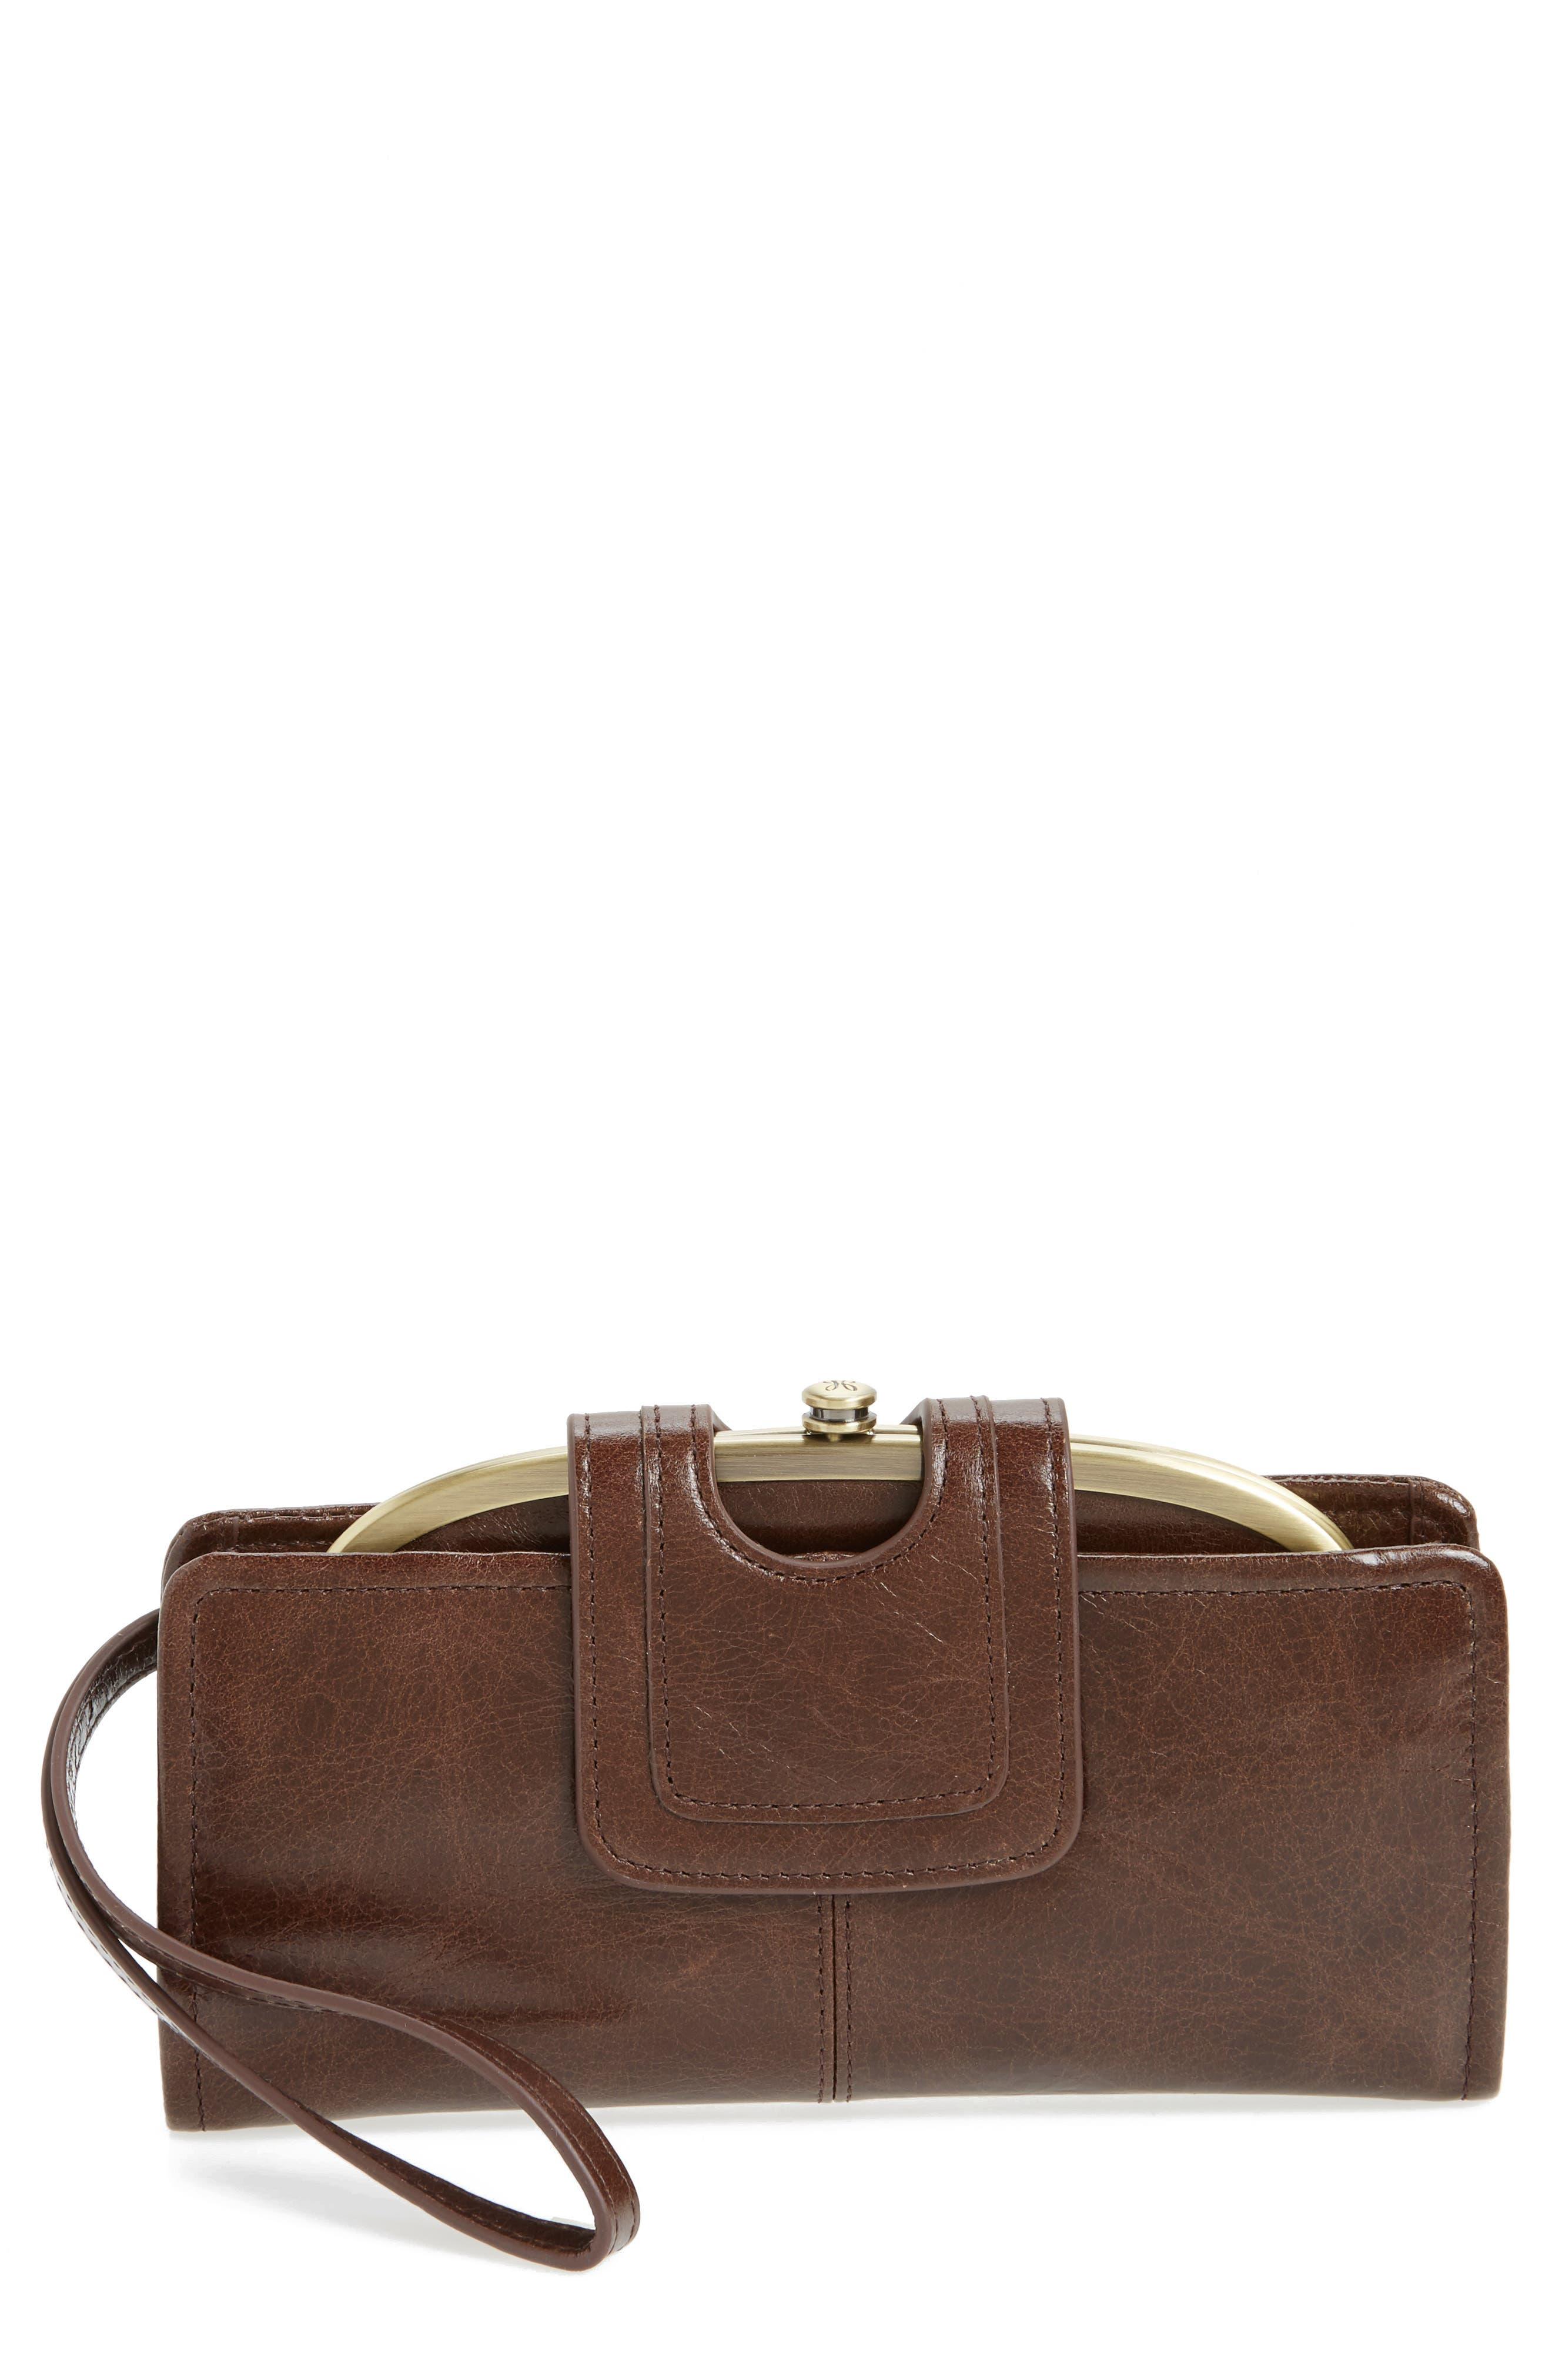 Hobo Nova Calfskin Leather Wallet